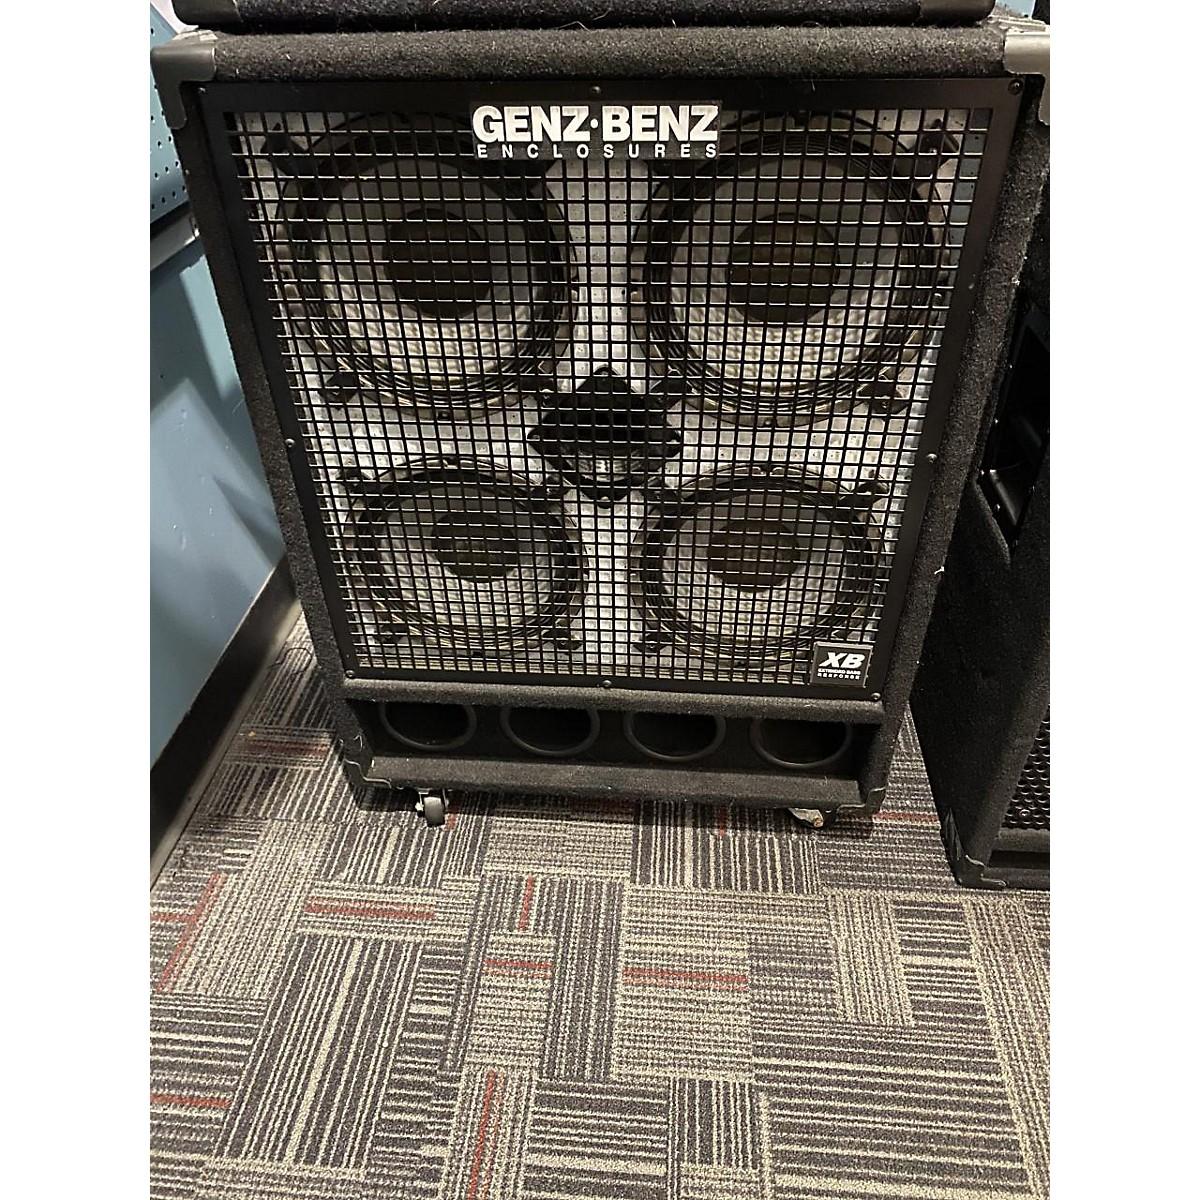 Genz Benz GB410T 4Ohm 4x10 Bass Cabinet